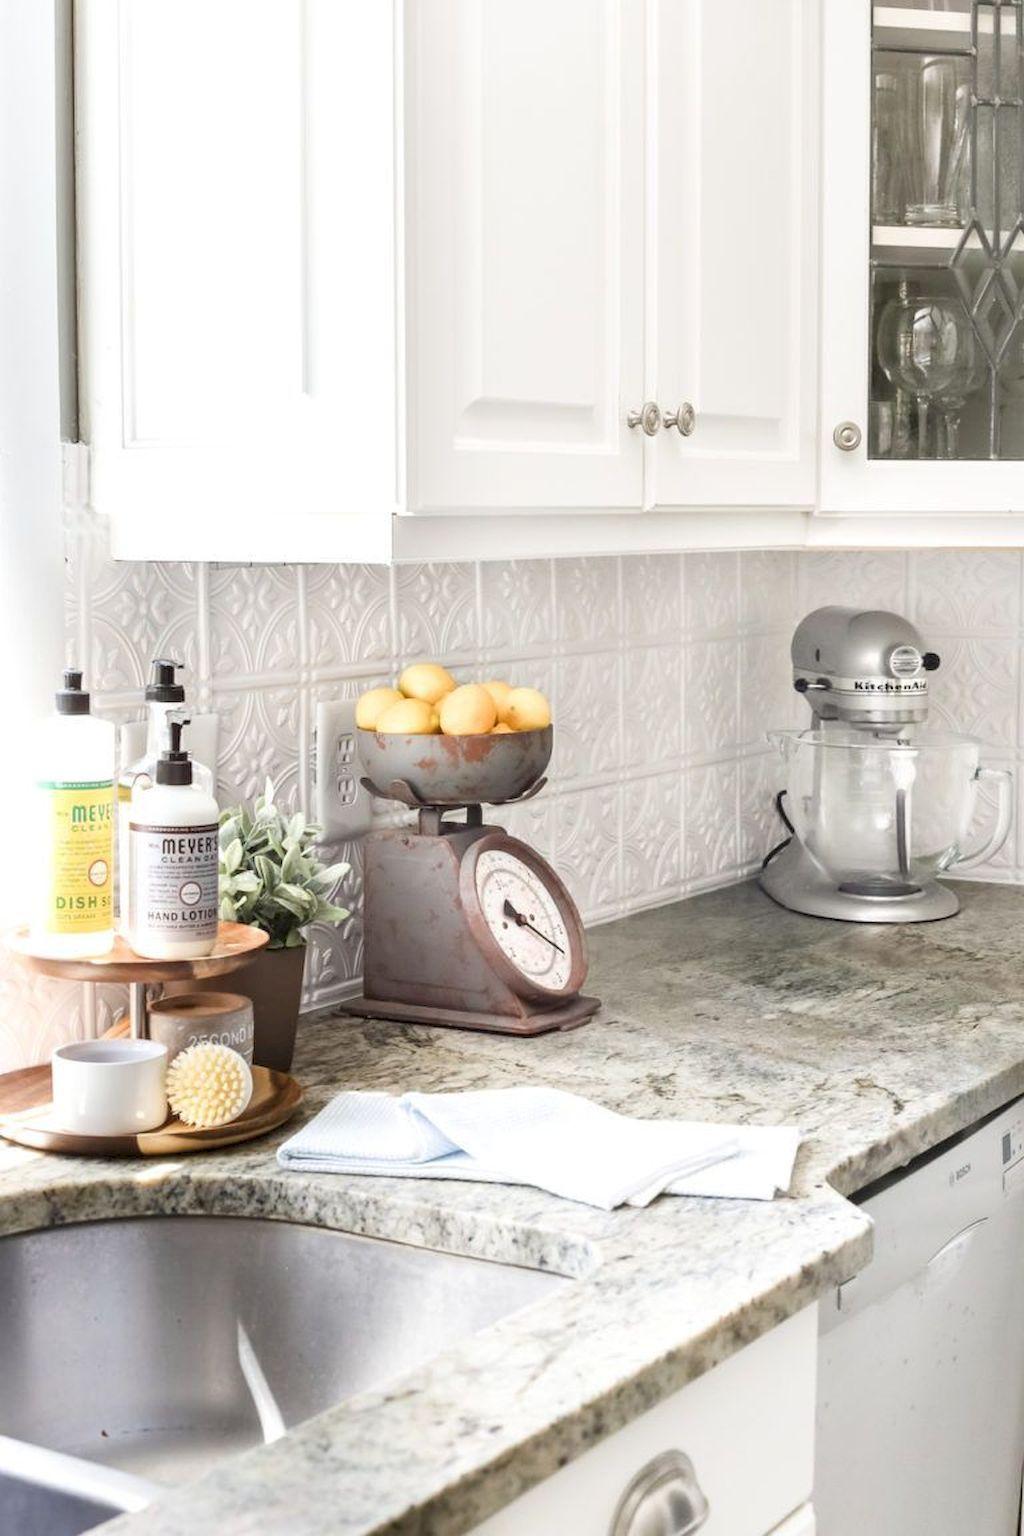 10 Simple And Impressive Ideas Colorful Backsplash Paint Kitchen